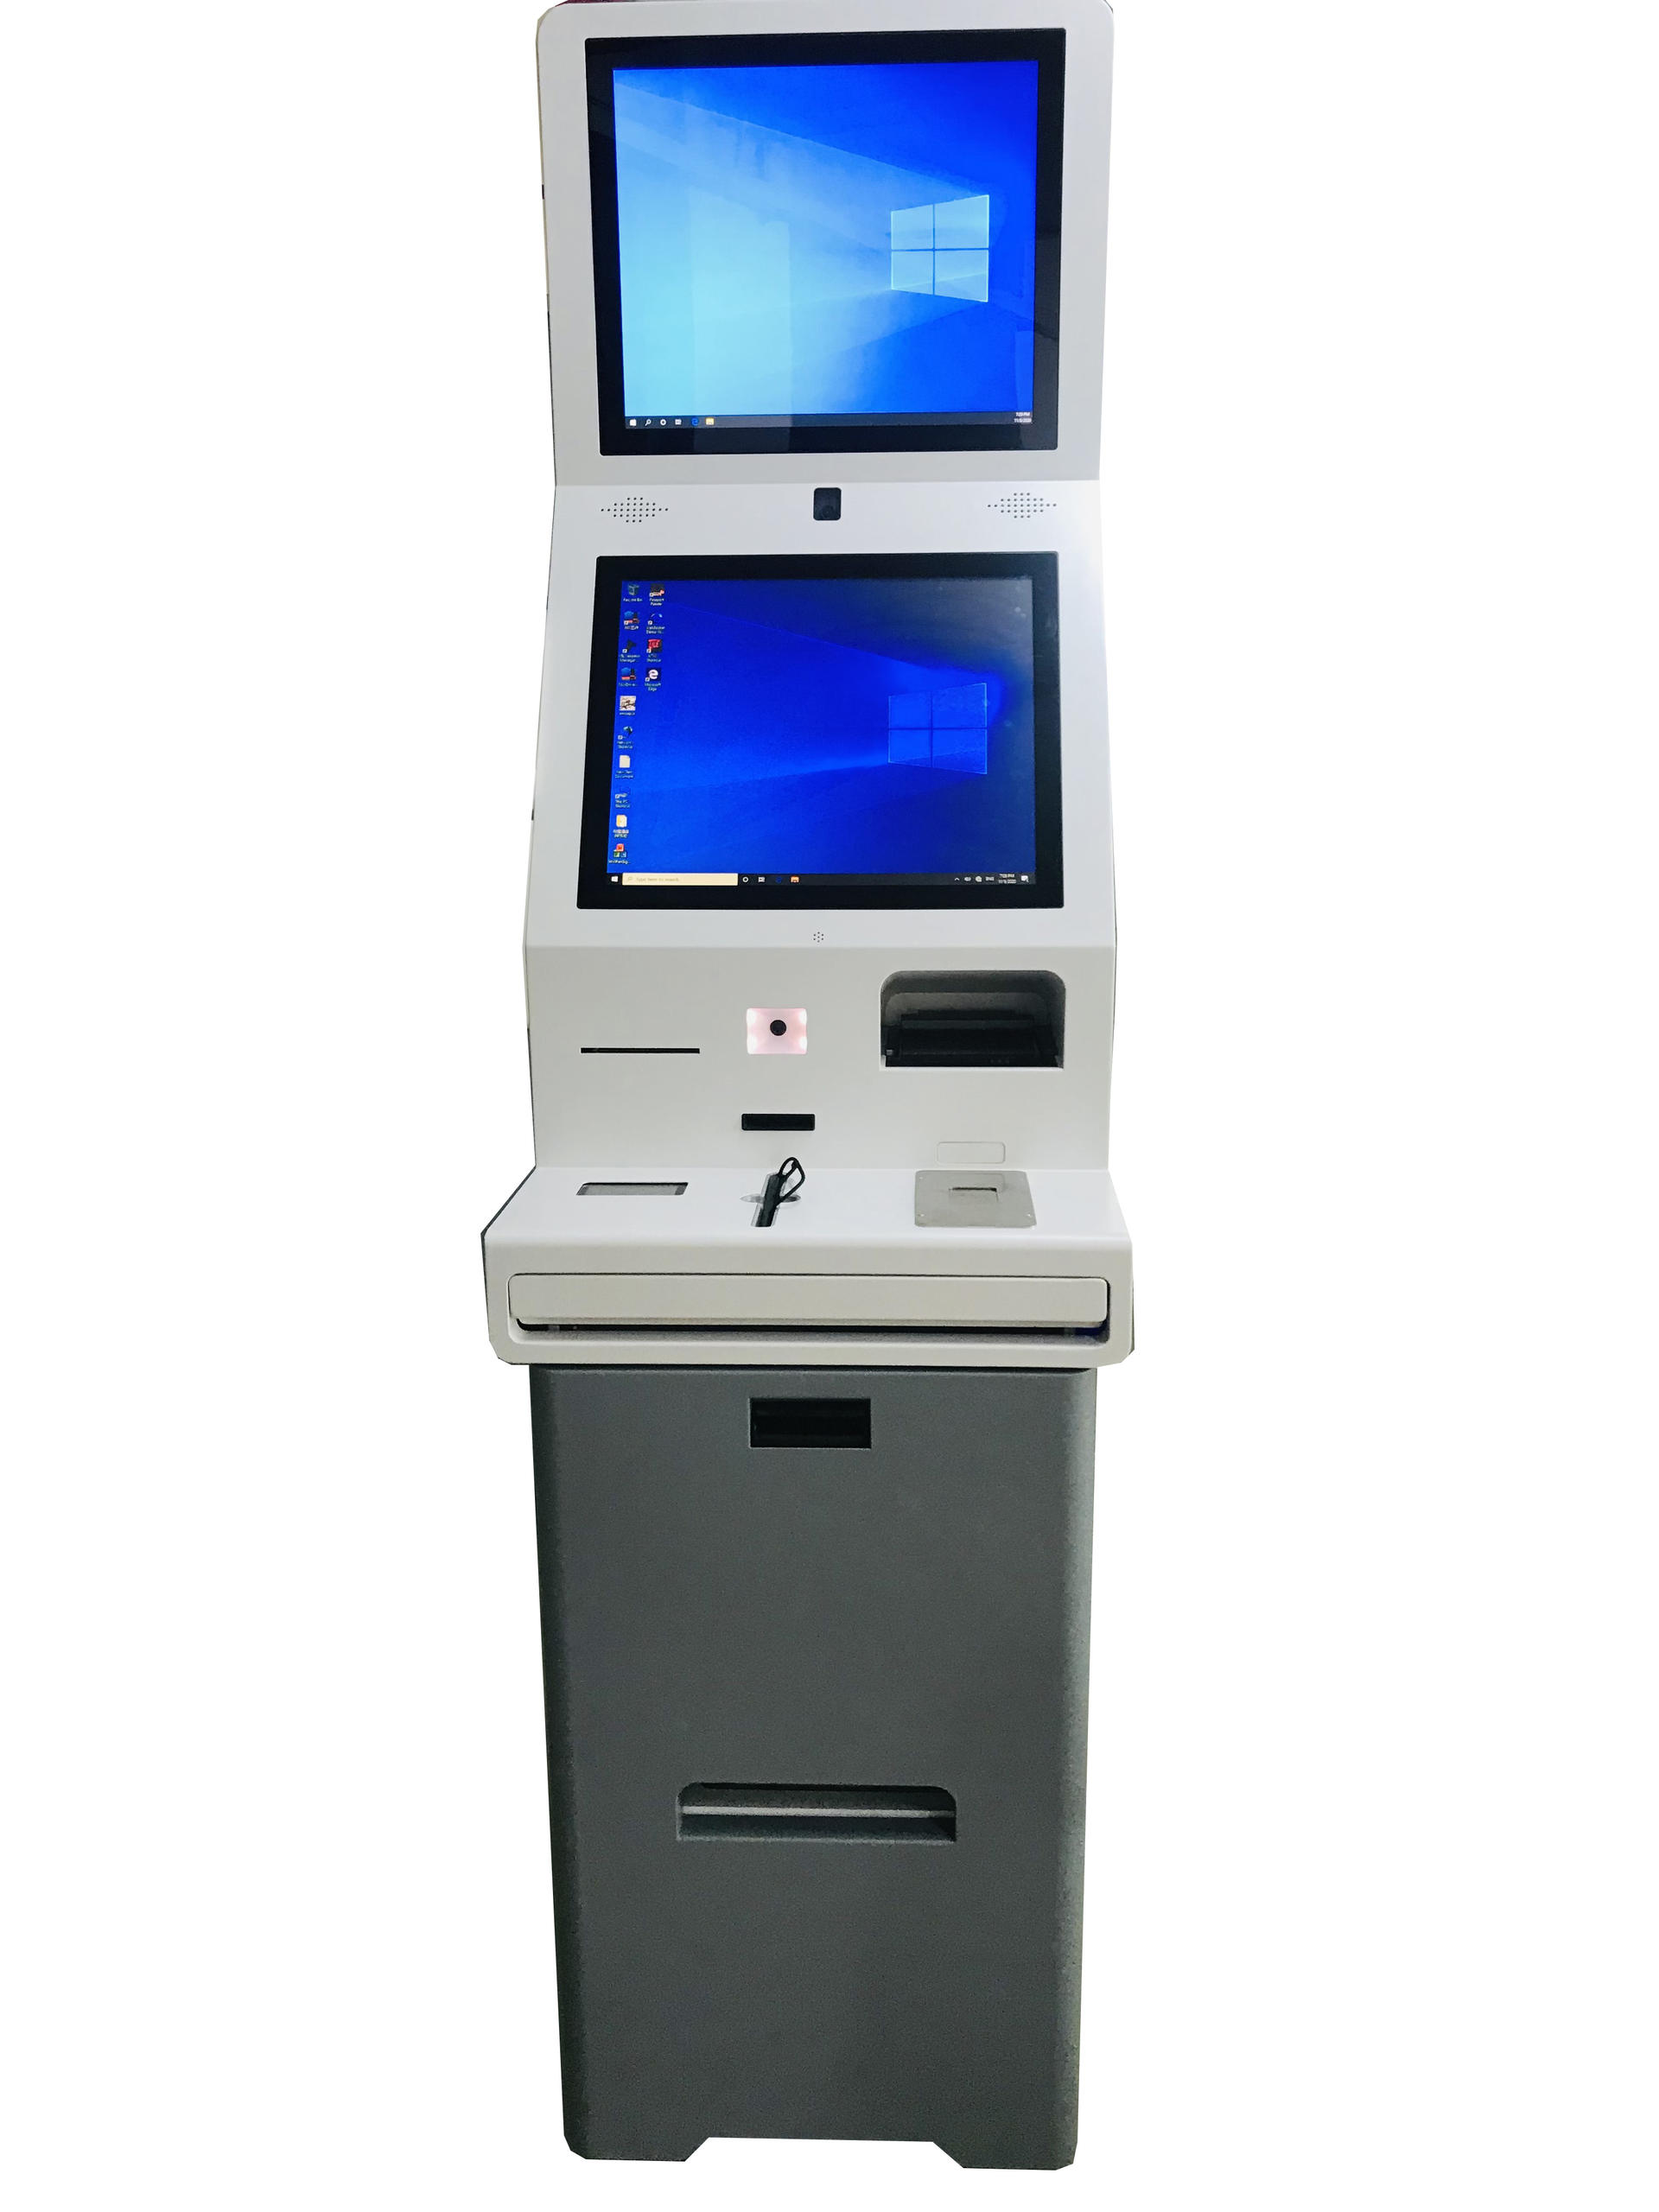 Hotel Kiosk Room Card Dispenser with Hotel Management System